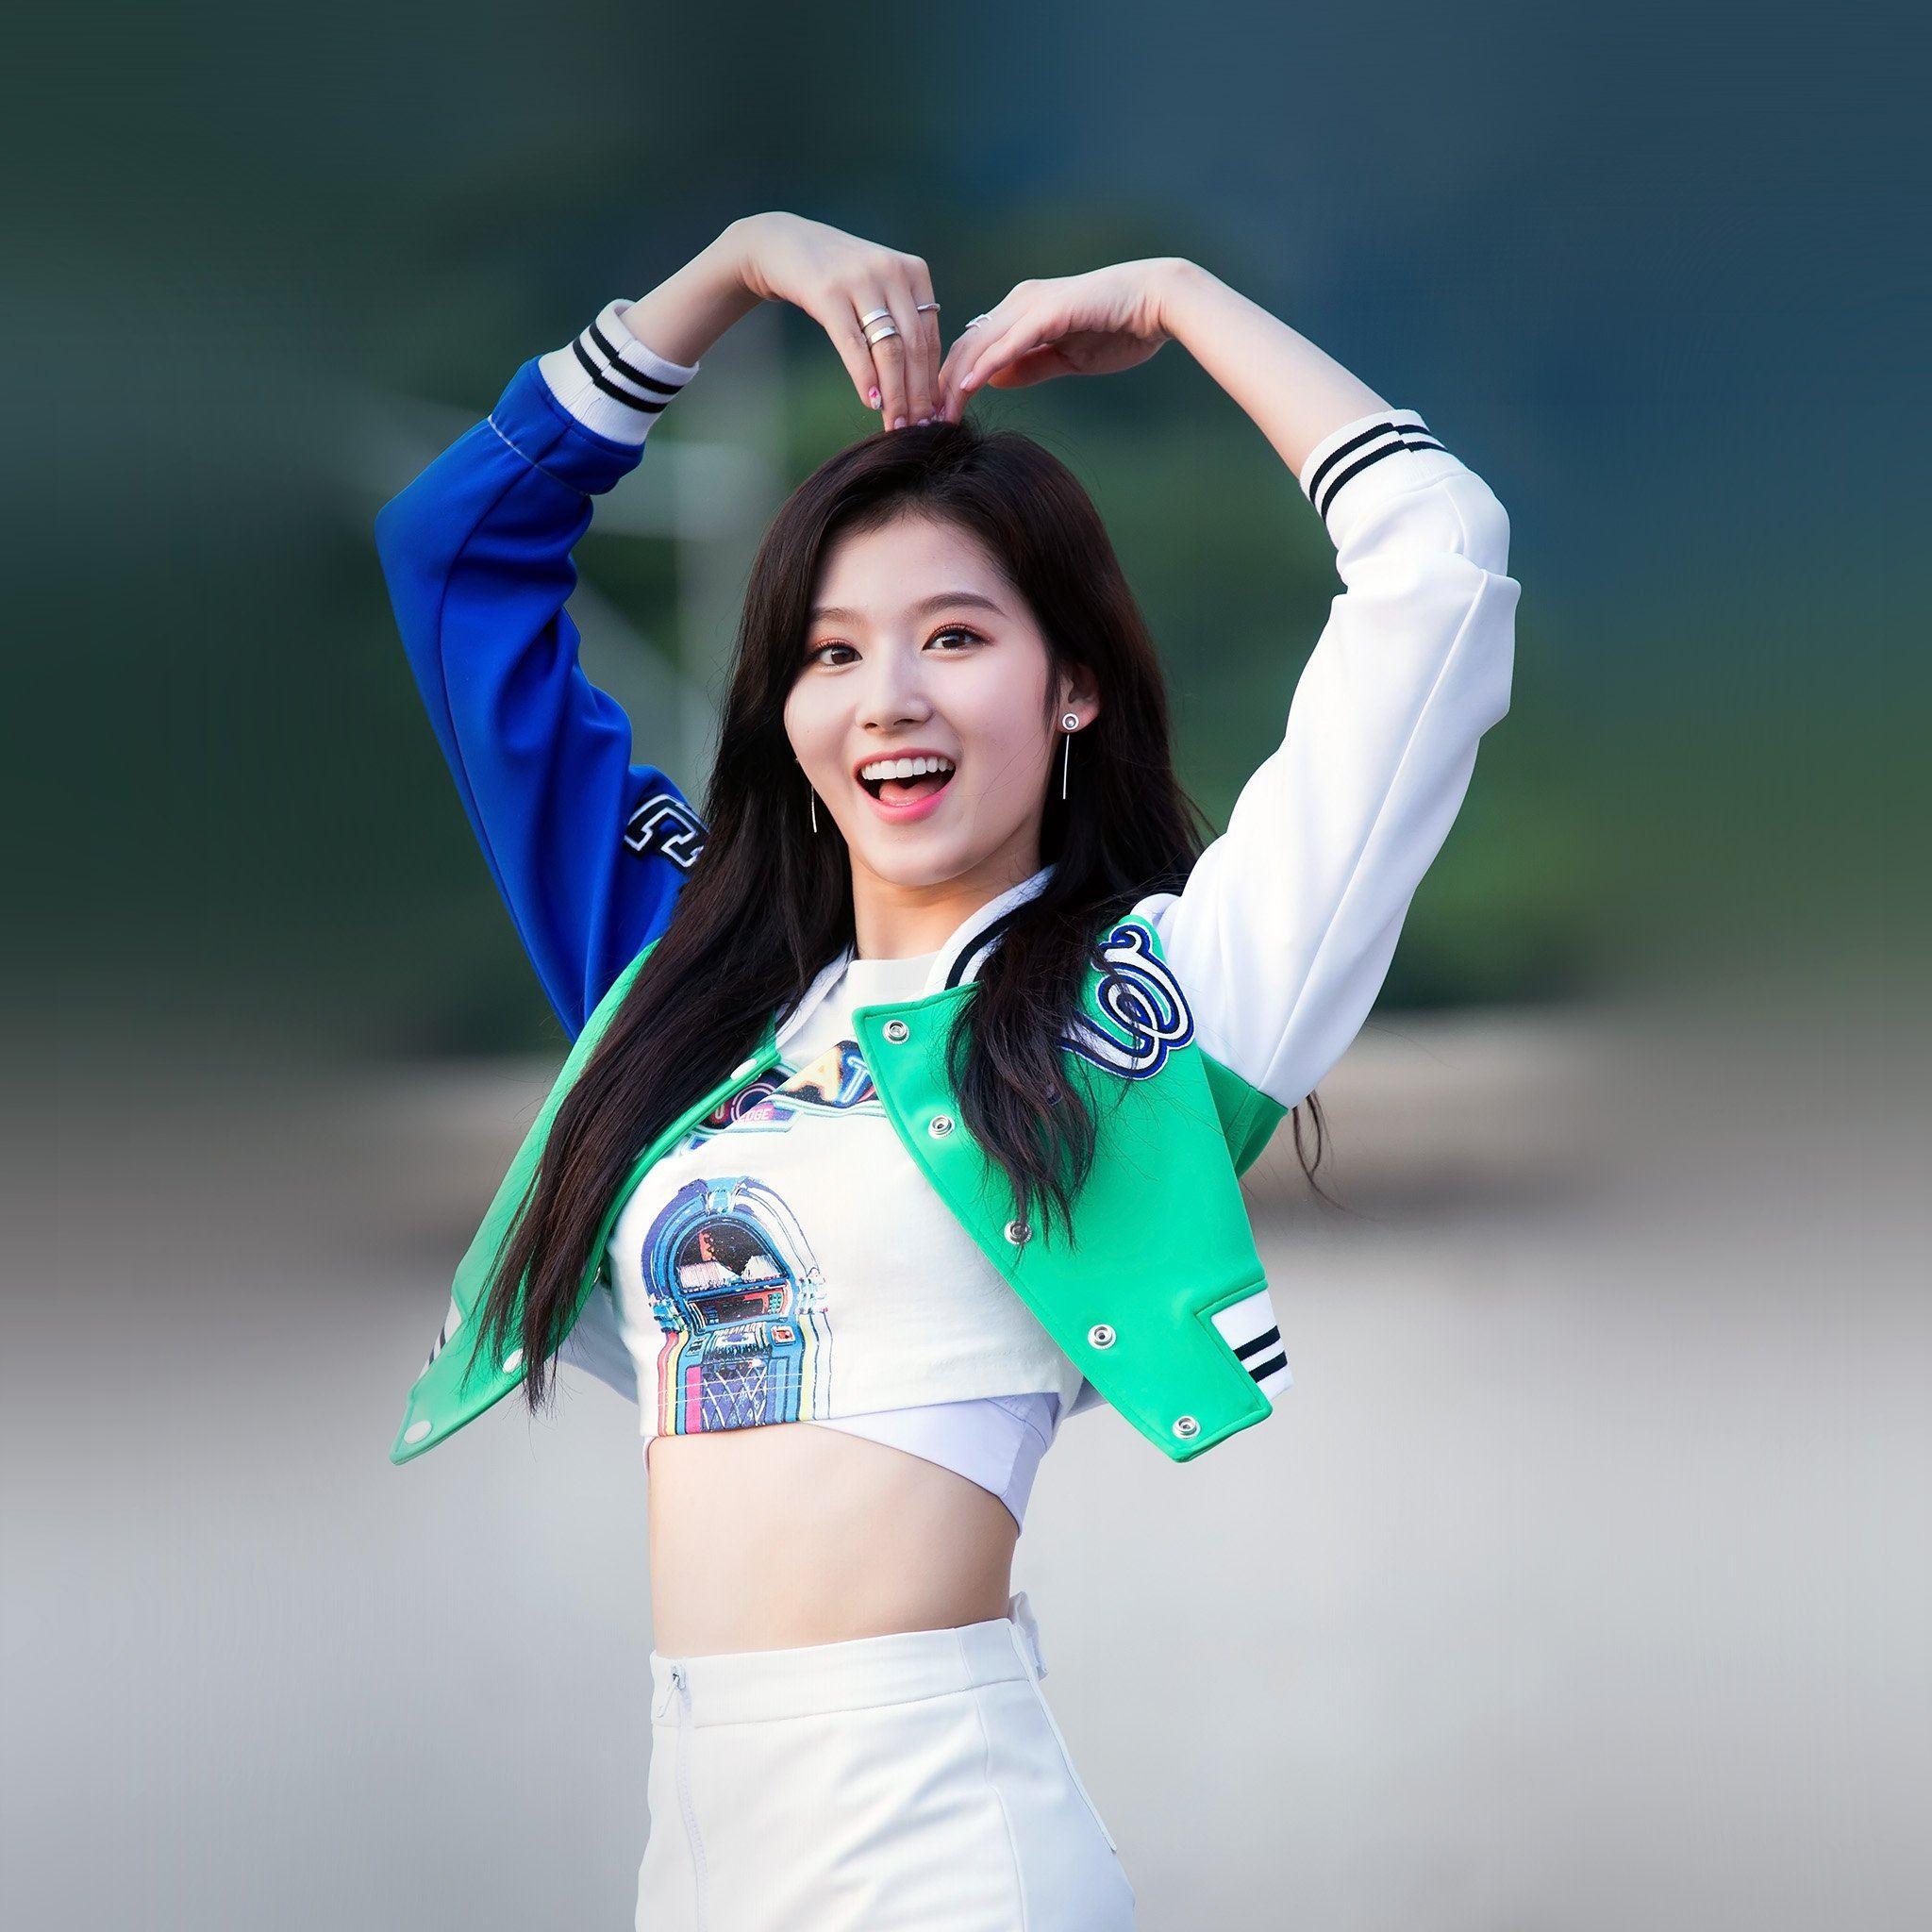 Kpop Sana Heart Love Cute Girl Celebrity iPad Air wallpaper